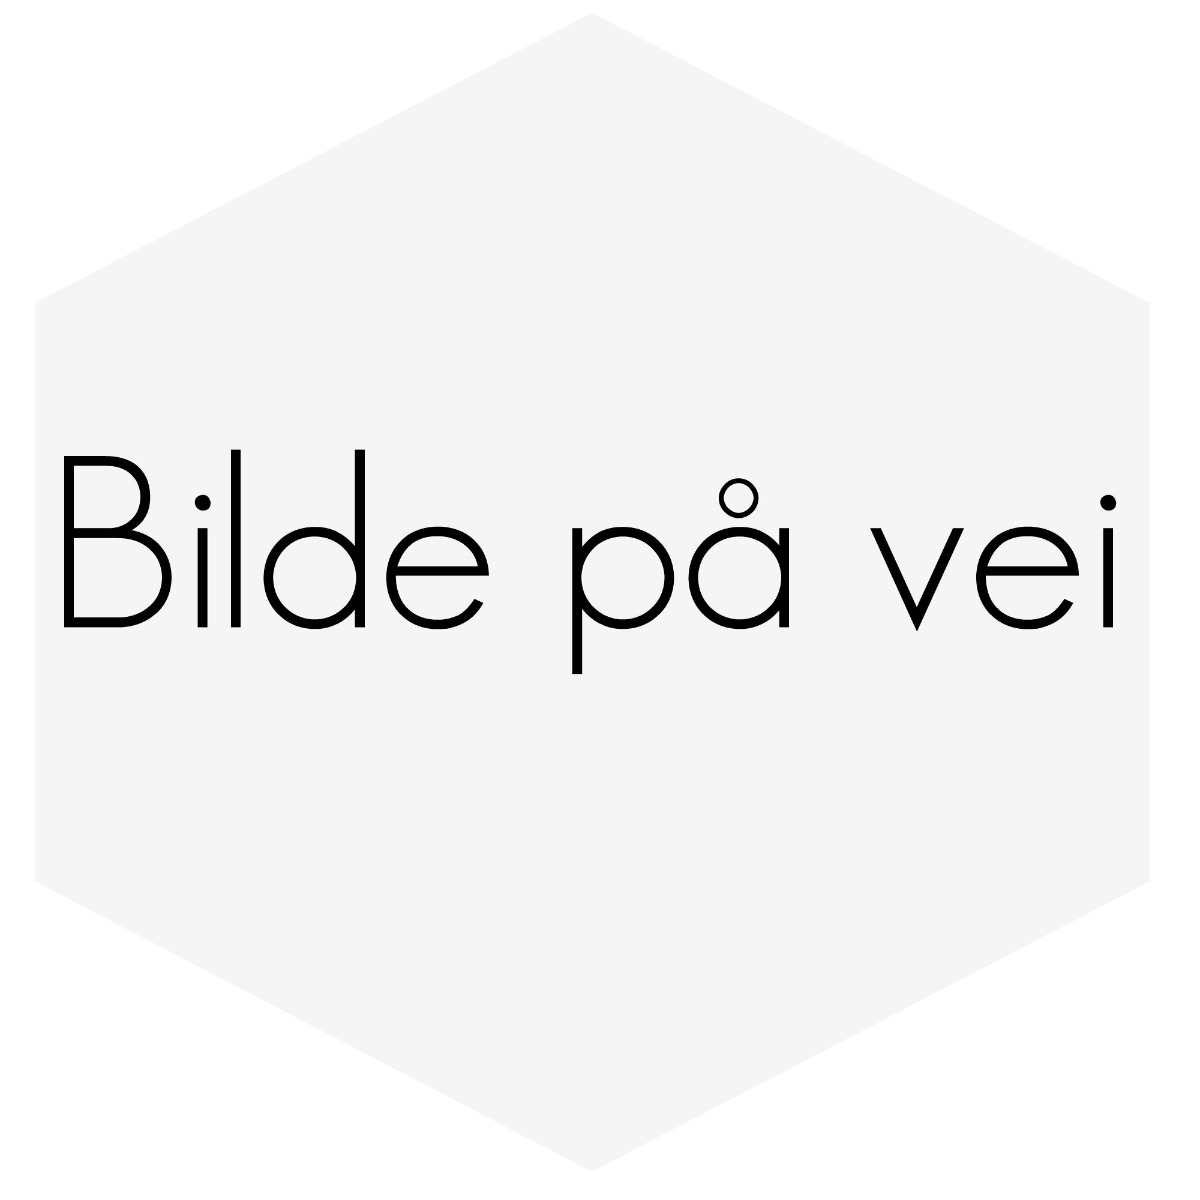 STØTDEMPER FORAN 740/60 OG 940 85-98 BILSTEIN SPRINT stk